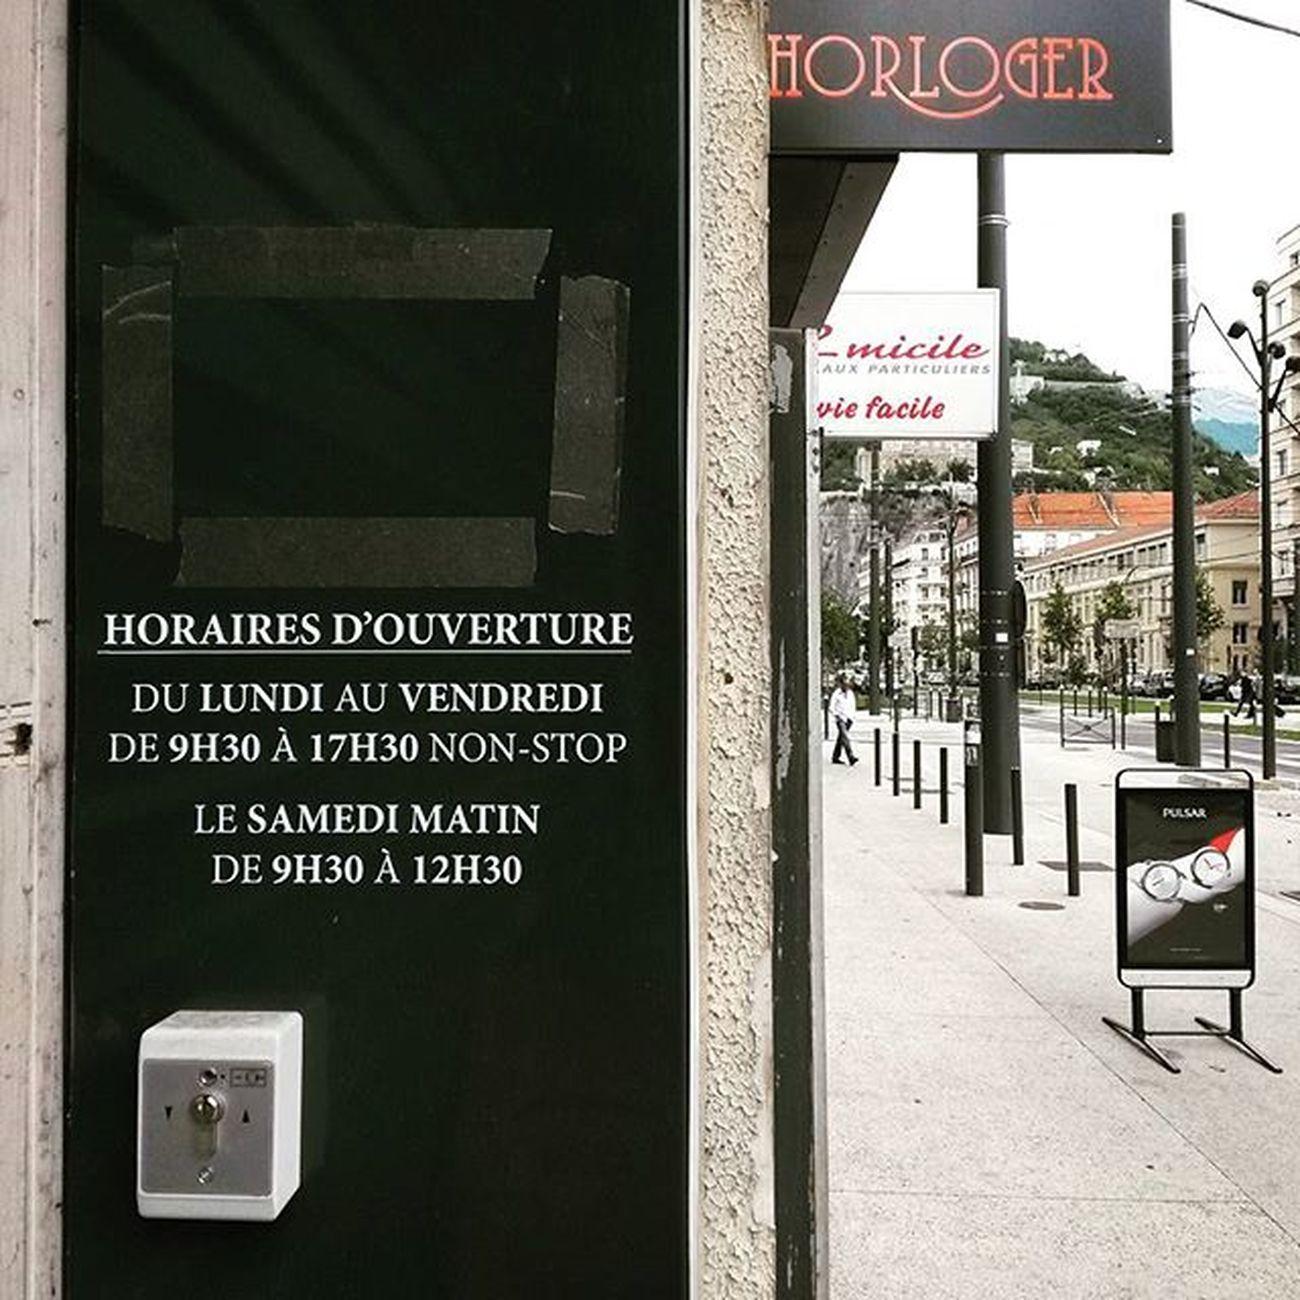 Horaires de l'Horloger , Grenoble , 2015  WHPrhythm